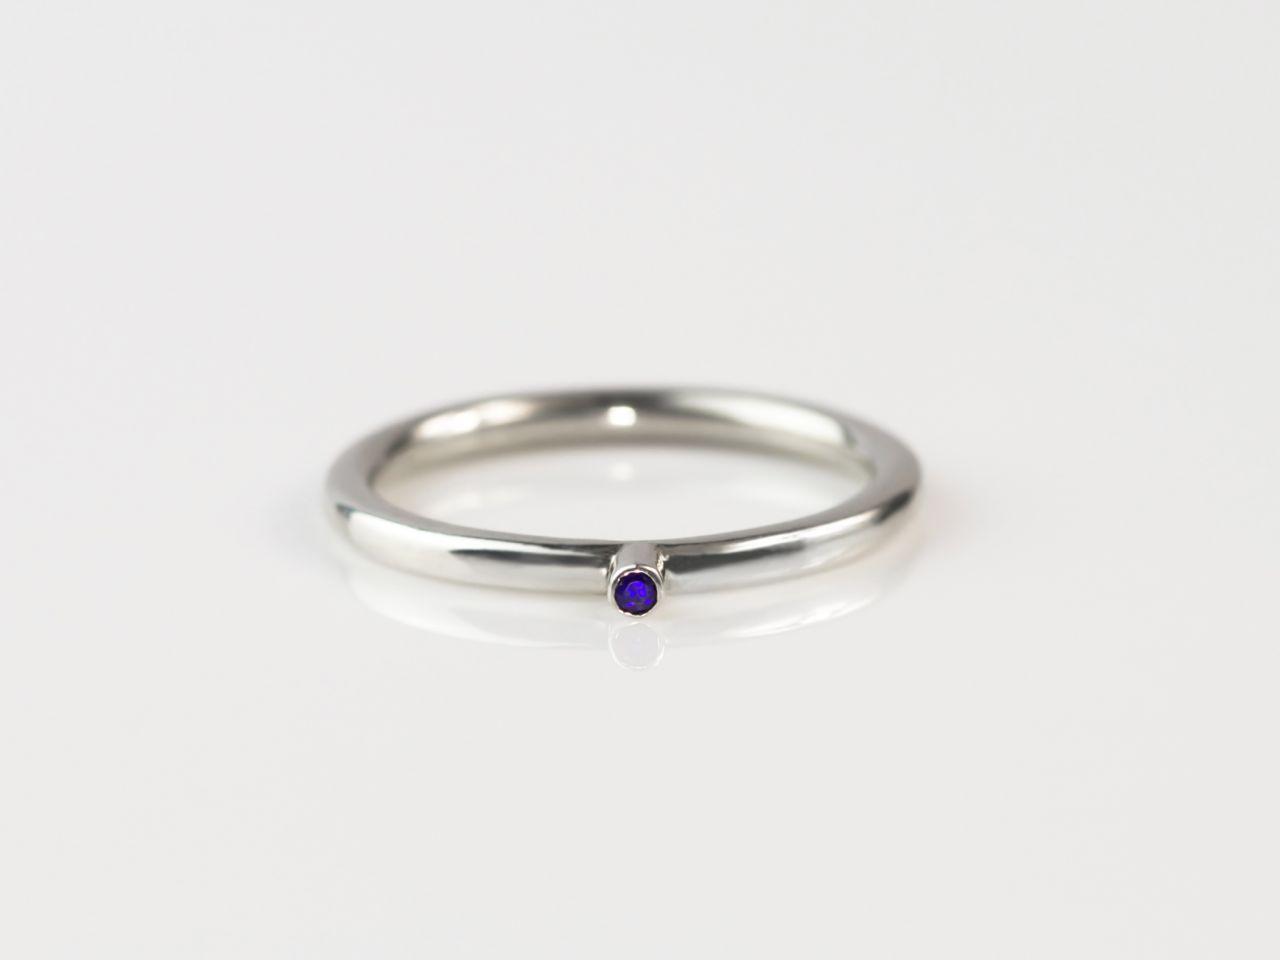 blauer punkt saphir ring aus 925er silber ausverkauft. Black Bedroom Furniture Sets. Home Design Ideas